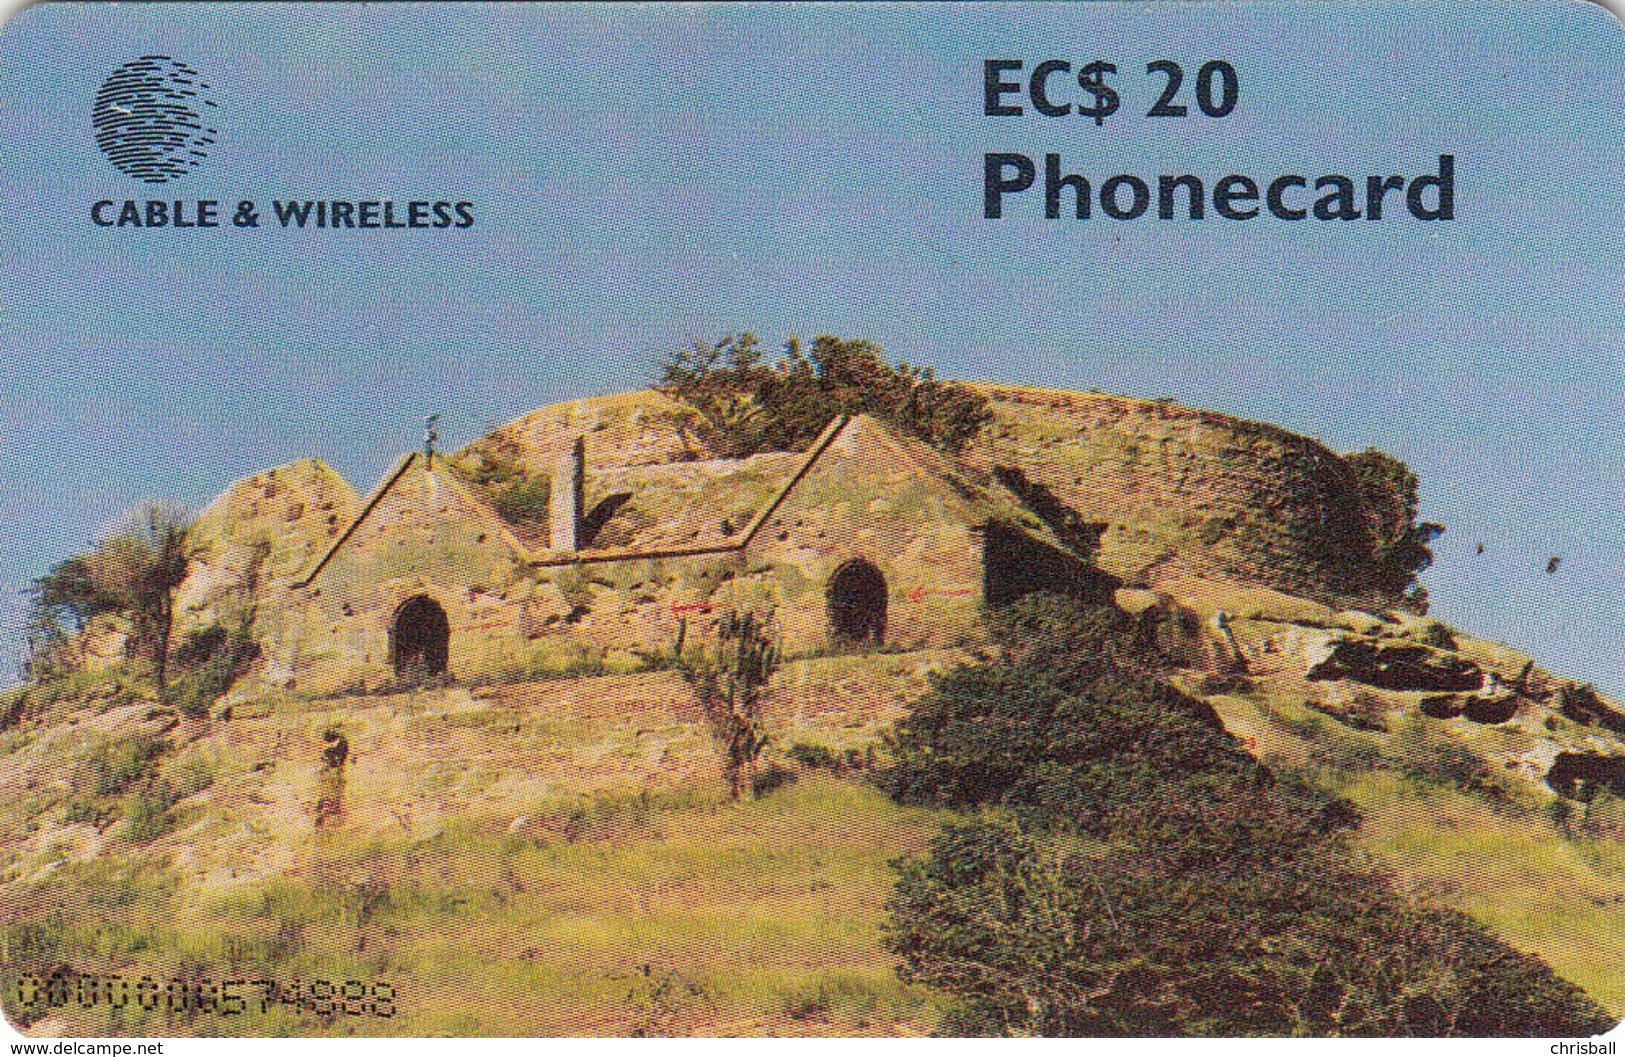 Antigua & Barbuda Phonecard - Chip Card (Fine Used) - Antigua And Barbuda